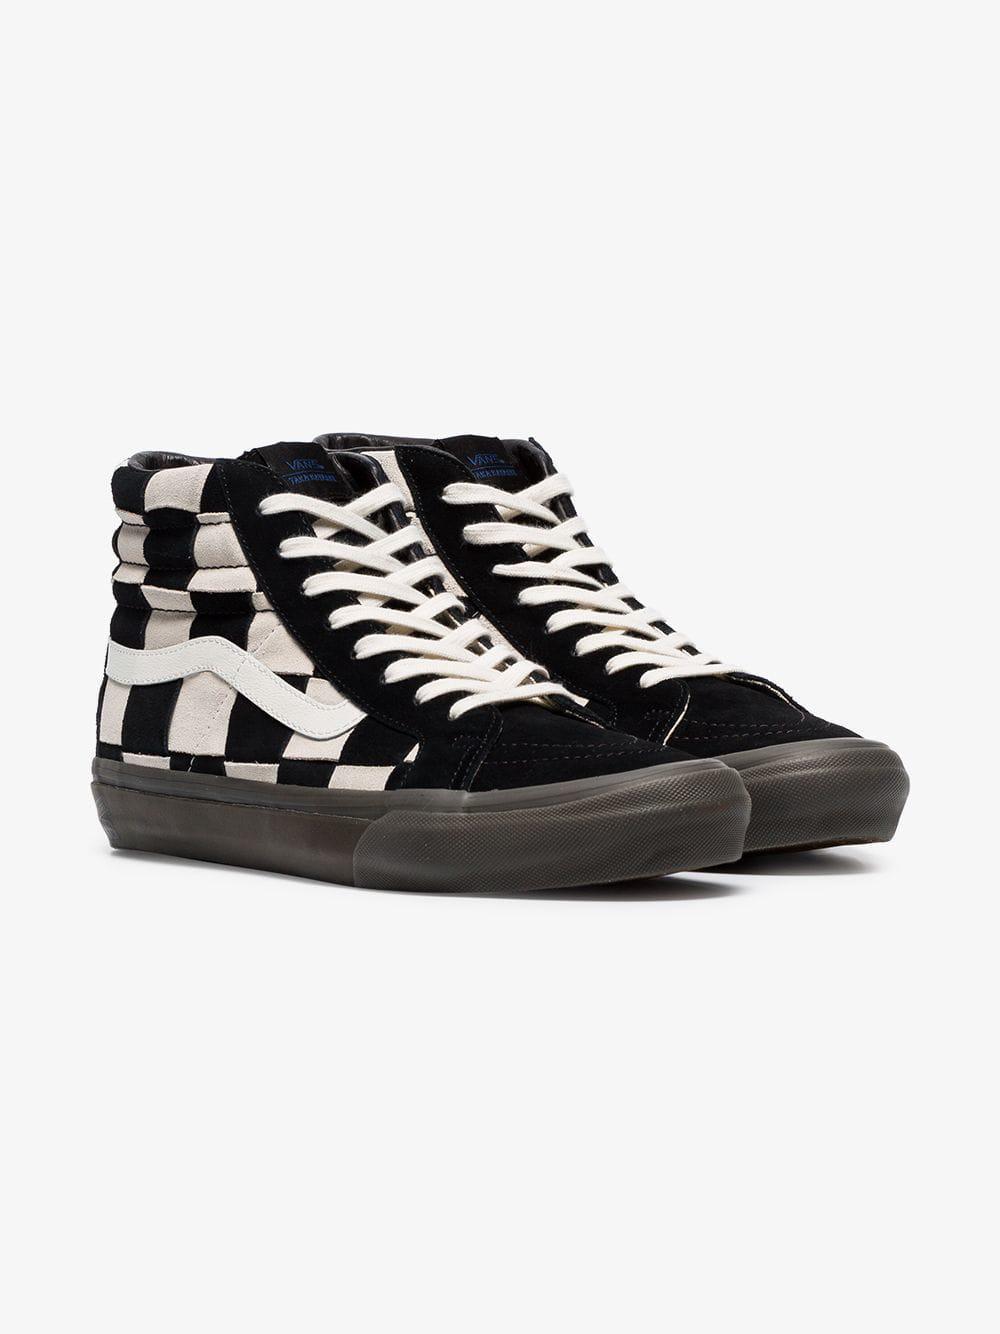 427e4841e5 Lyst - Vans Black And White Vault X Taka Hayashi Sk8-hi Sneakers in ...